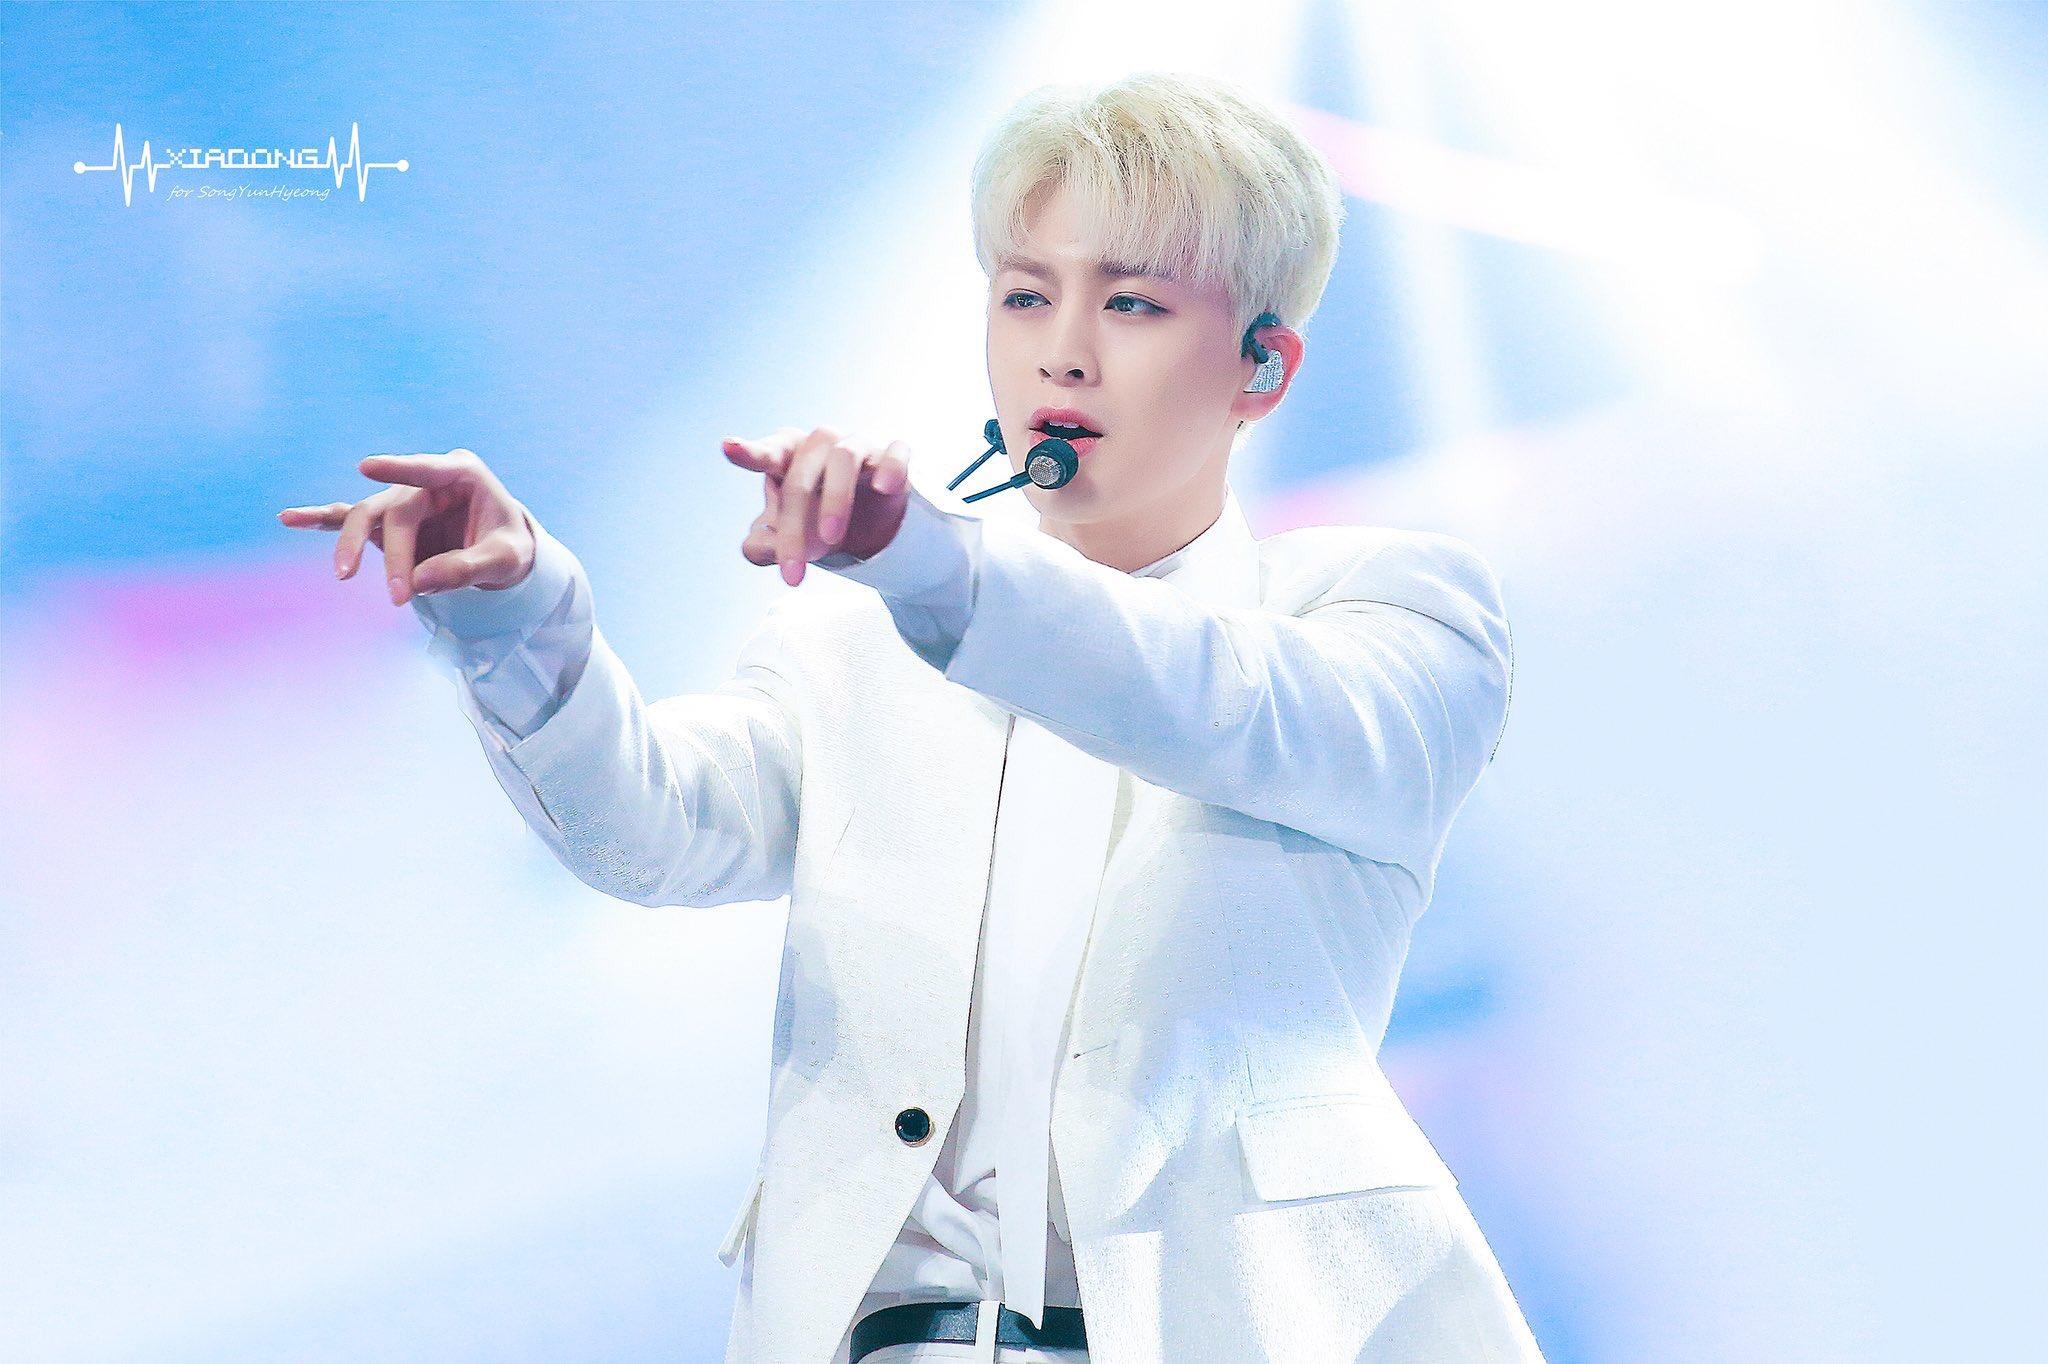 ikon, ikon profile, ikon facts, ikon members, ikon age, ikon weight, ikon height, ikon song, song, yunhyeong, ikon yunhyeong, song yunhyeong